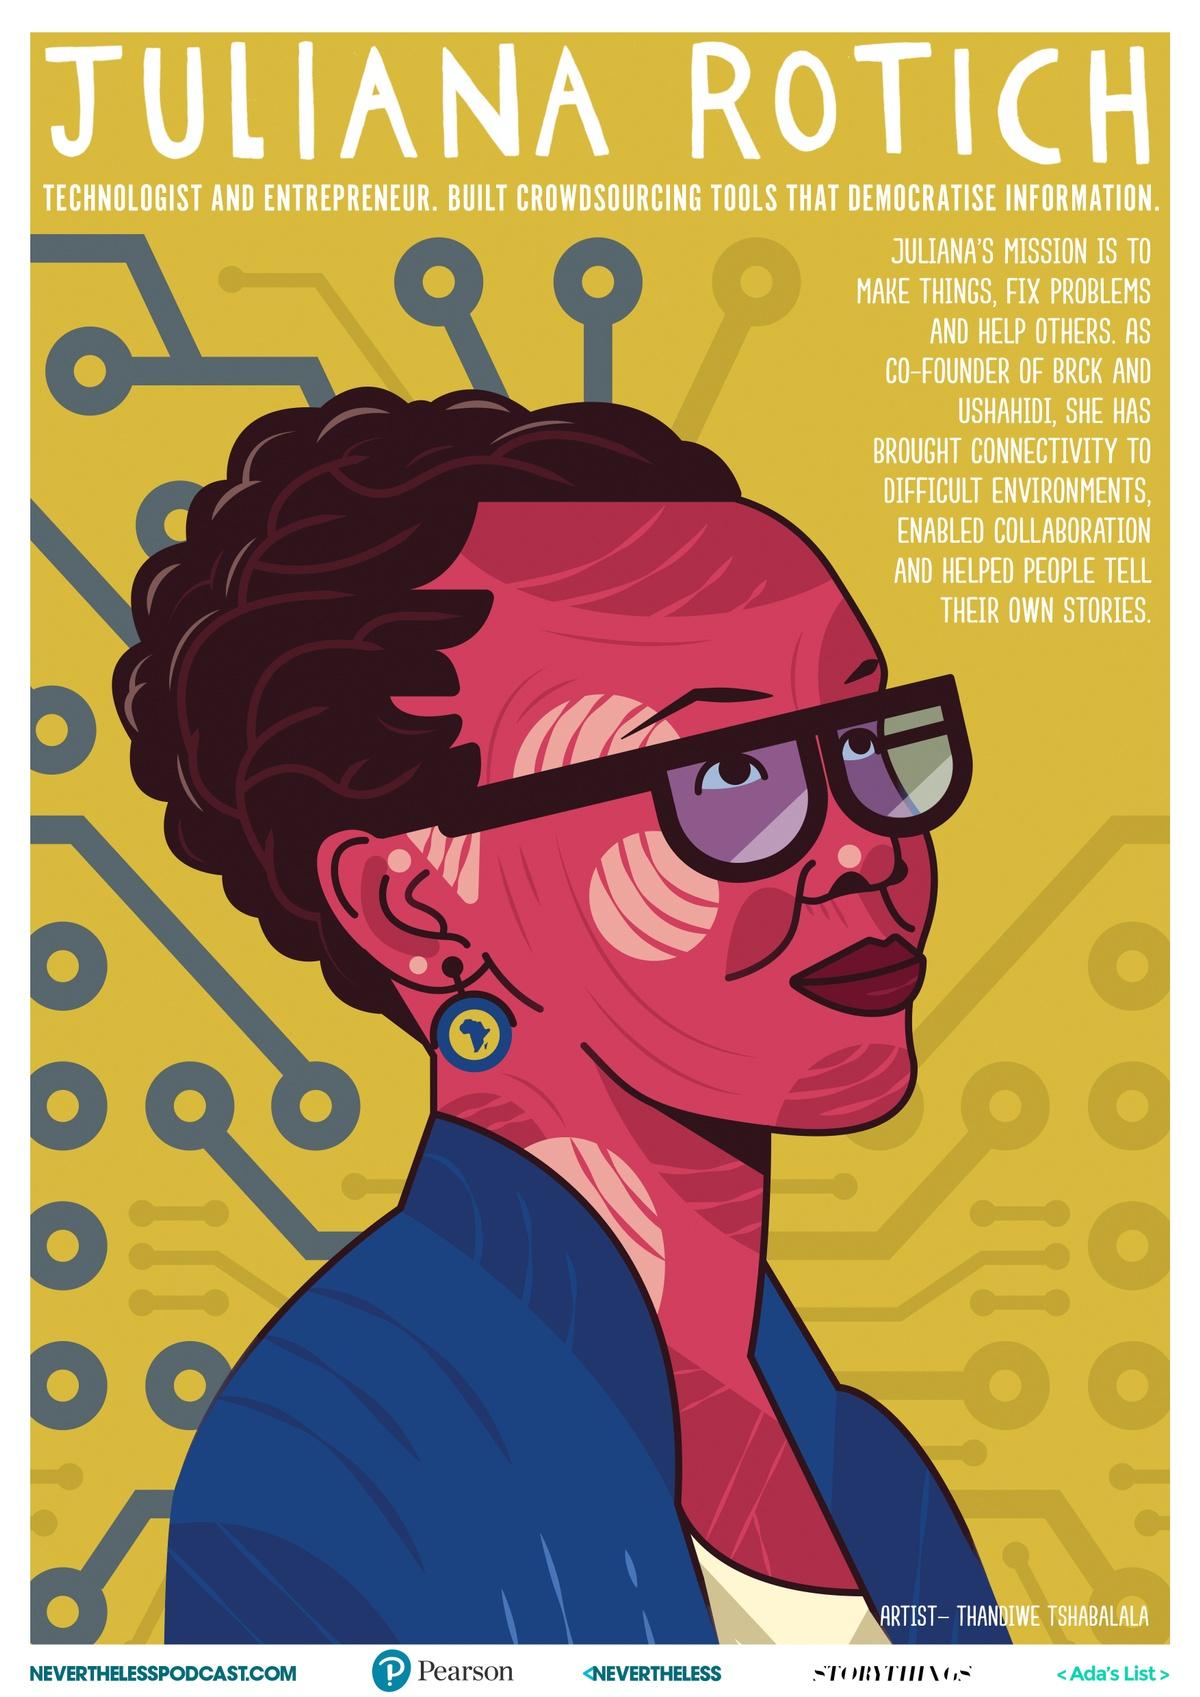 illustrated poster of Juliana Rotich by Thandiwe Tshabalala